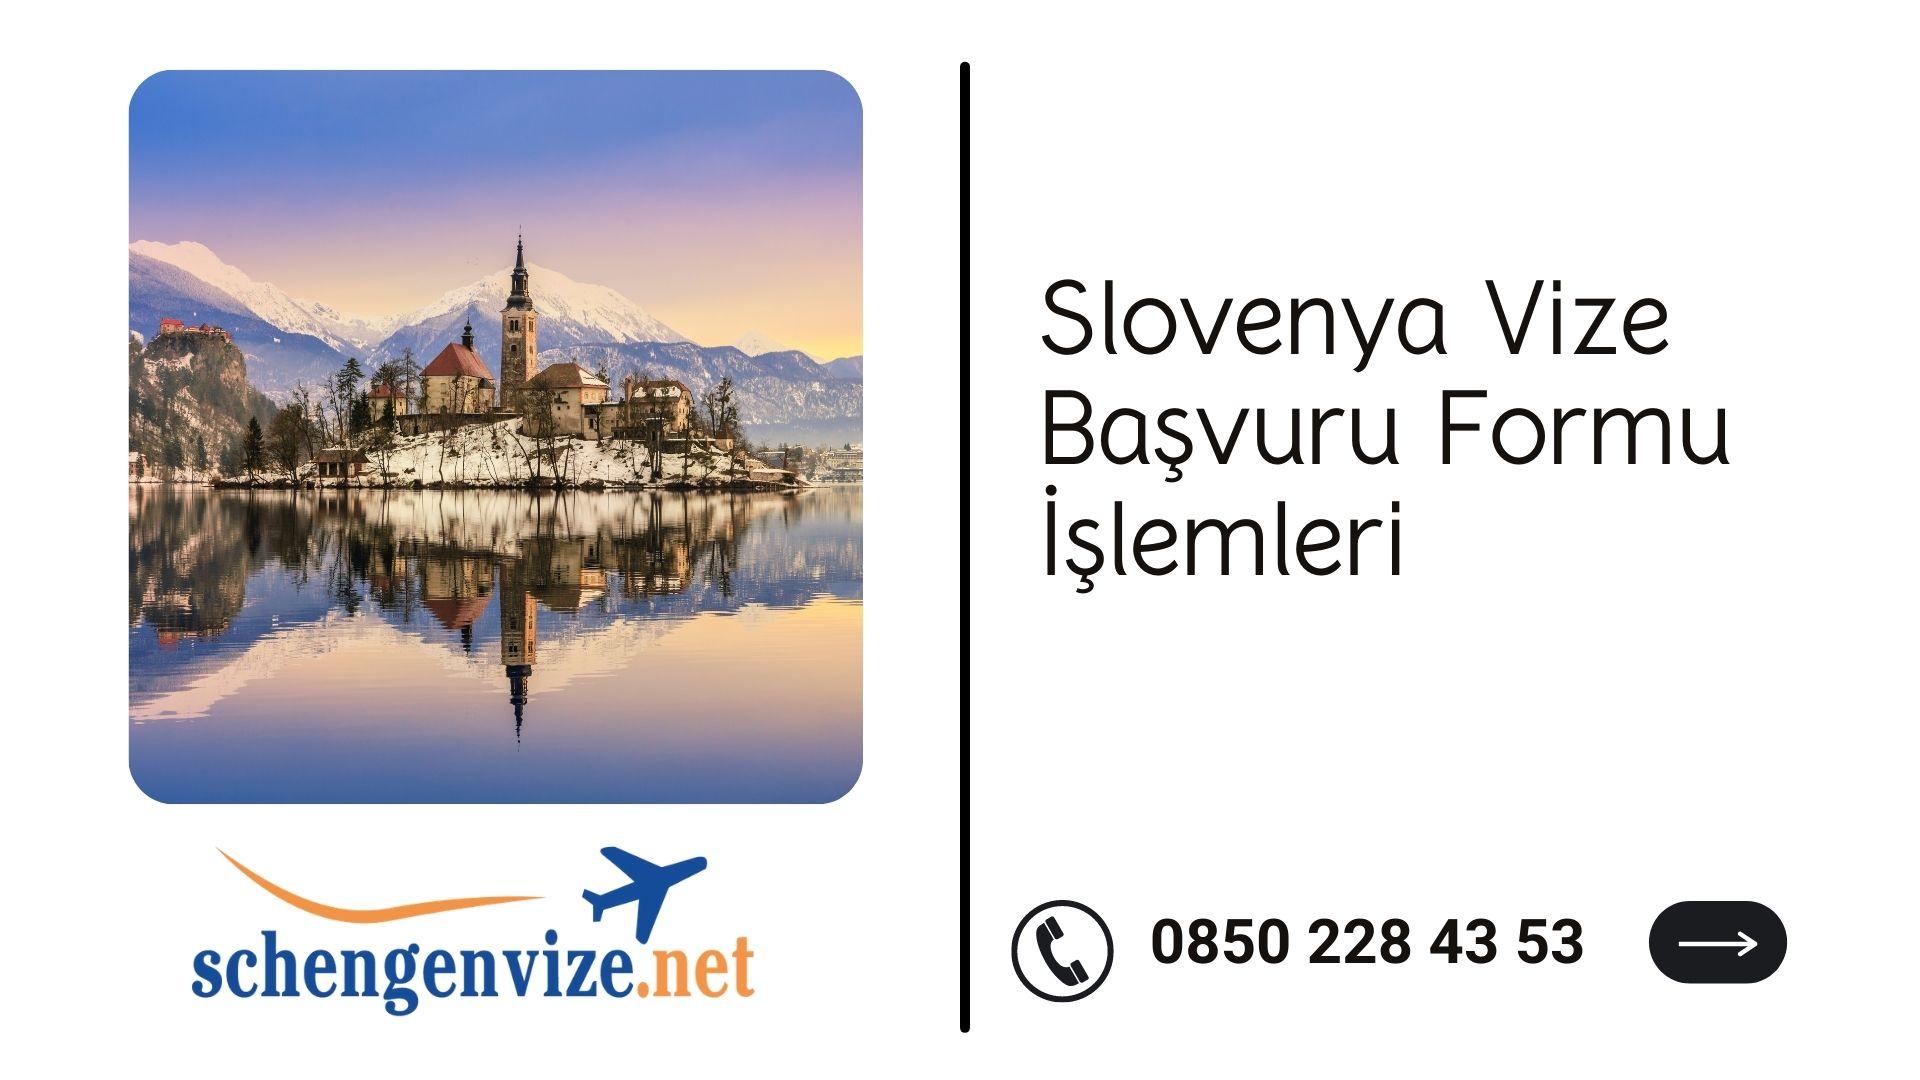 Slovenya Vize Başvuru Formu İşlemleri